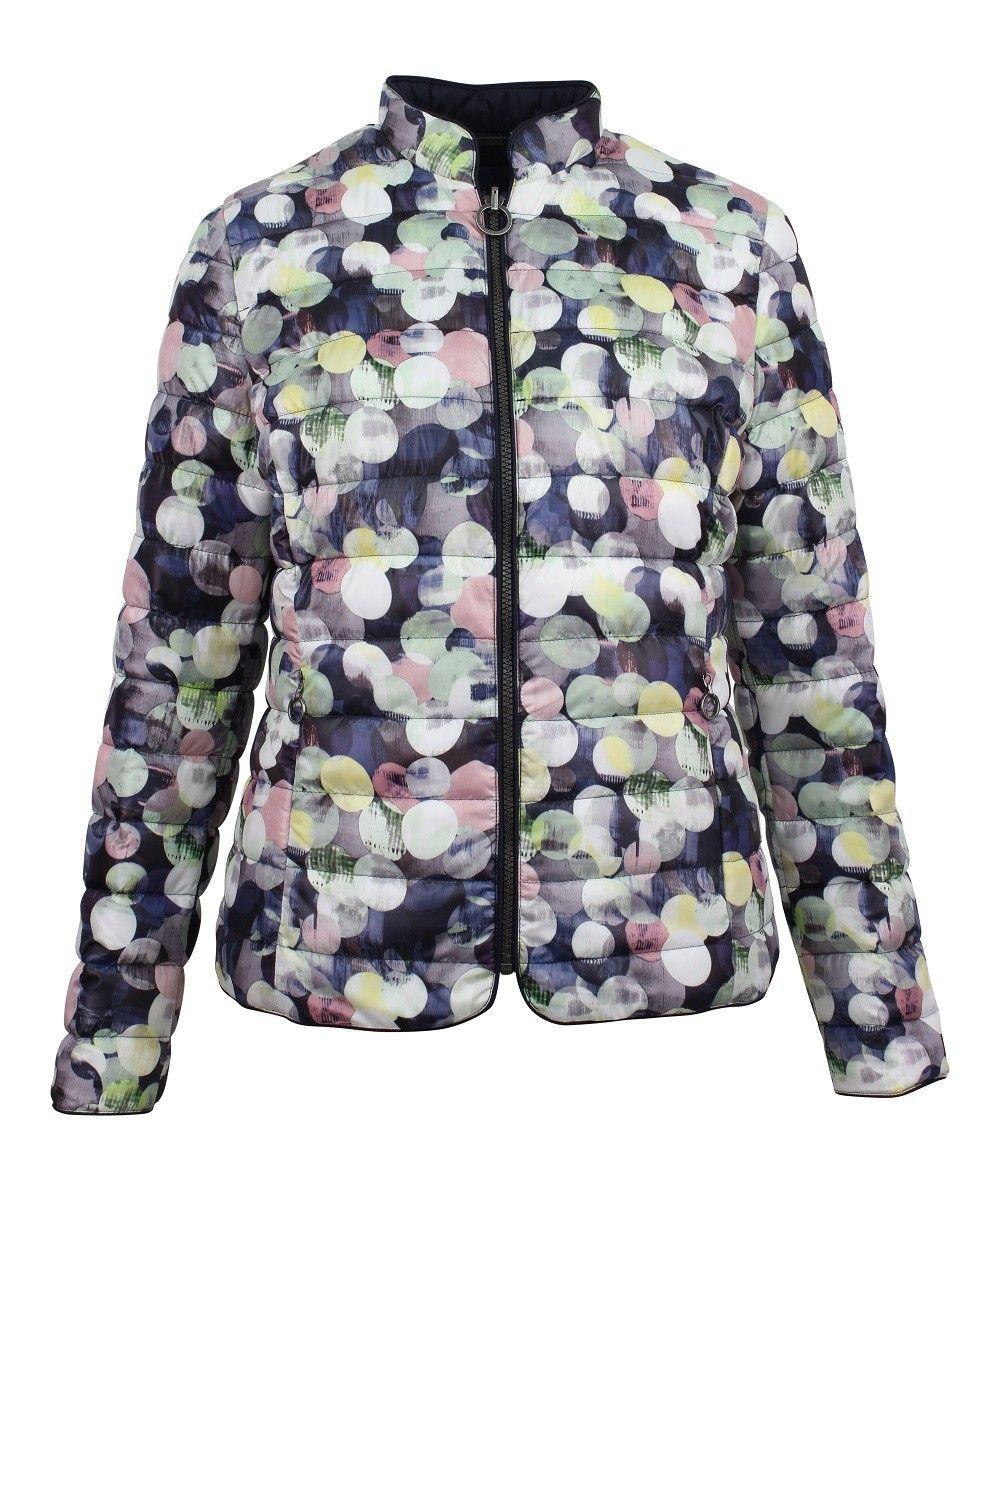 auf großhandel Luxus kaufen Super Specials Barbara Lebek Light Quilted Reversible Jacket | BargainsRus ...